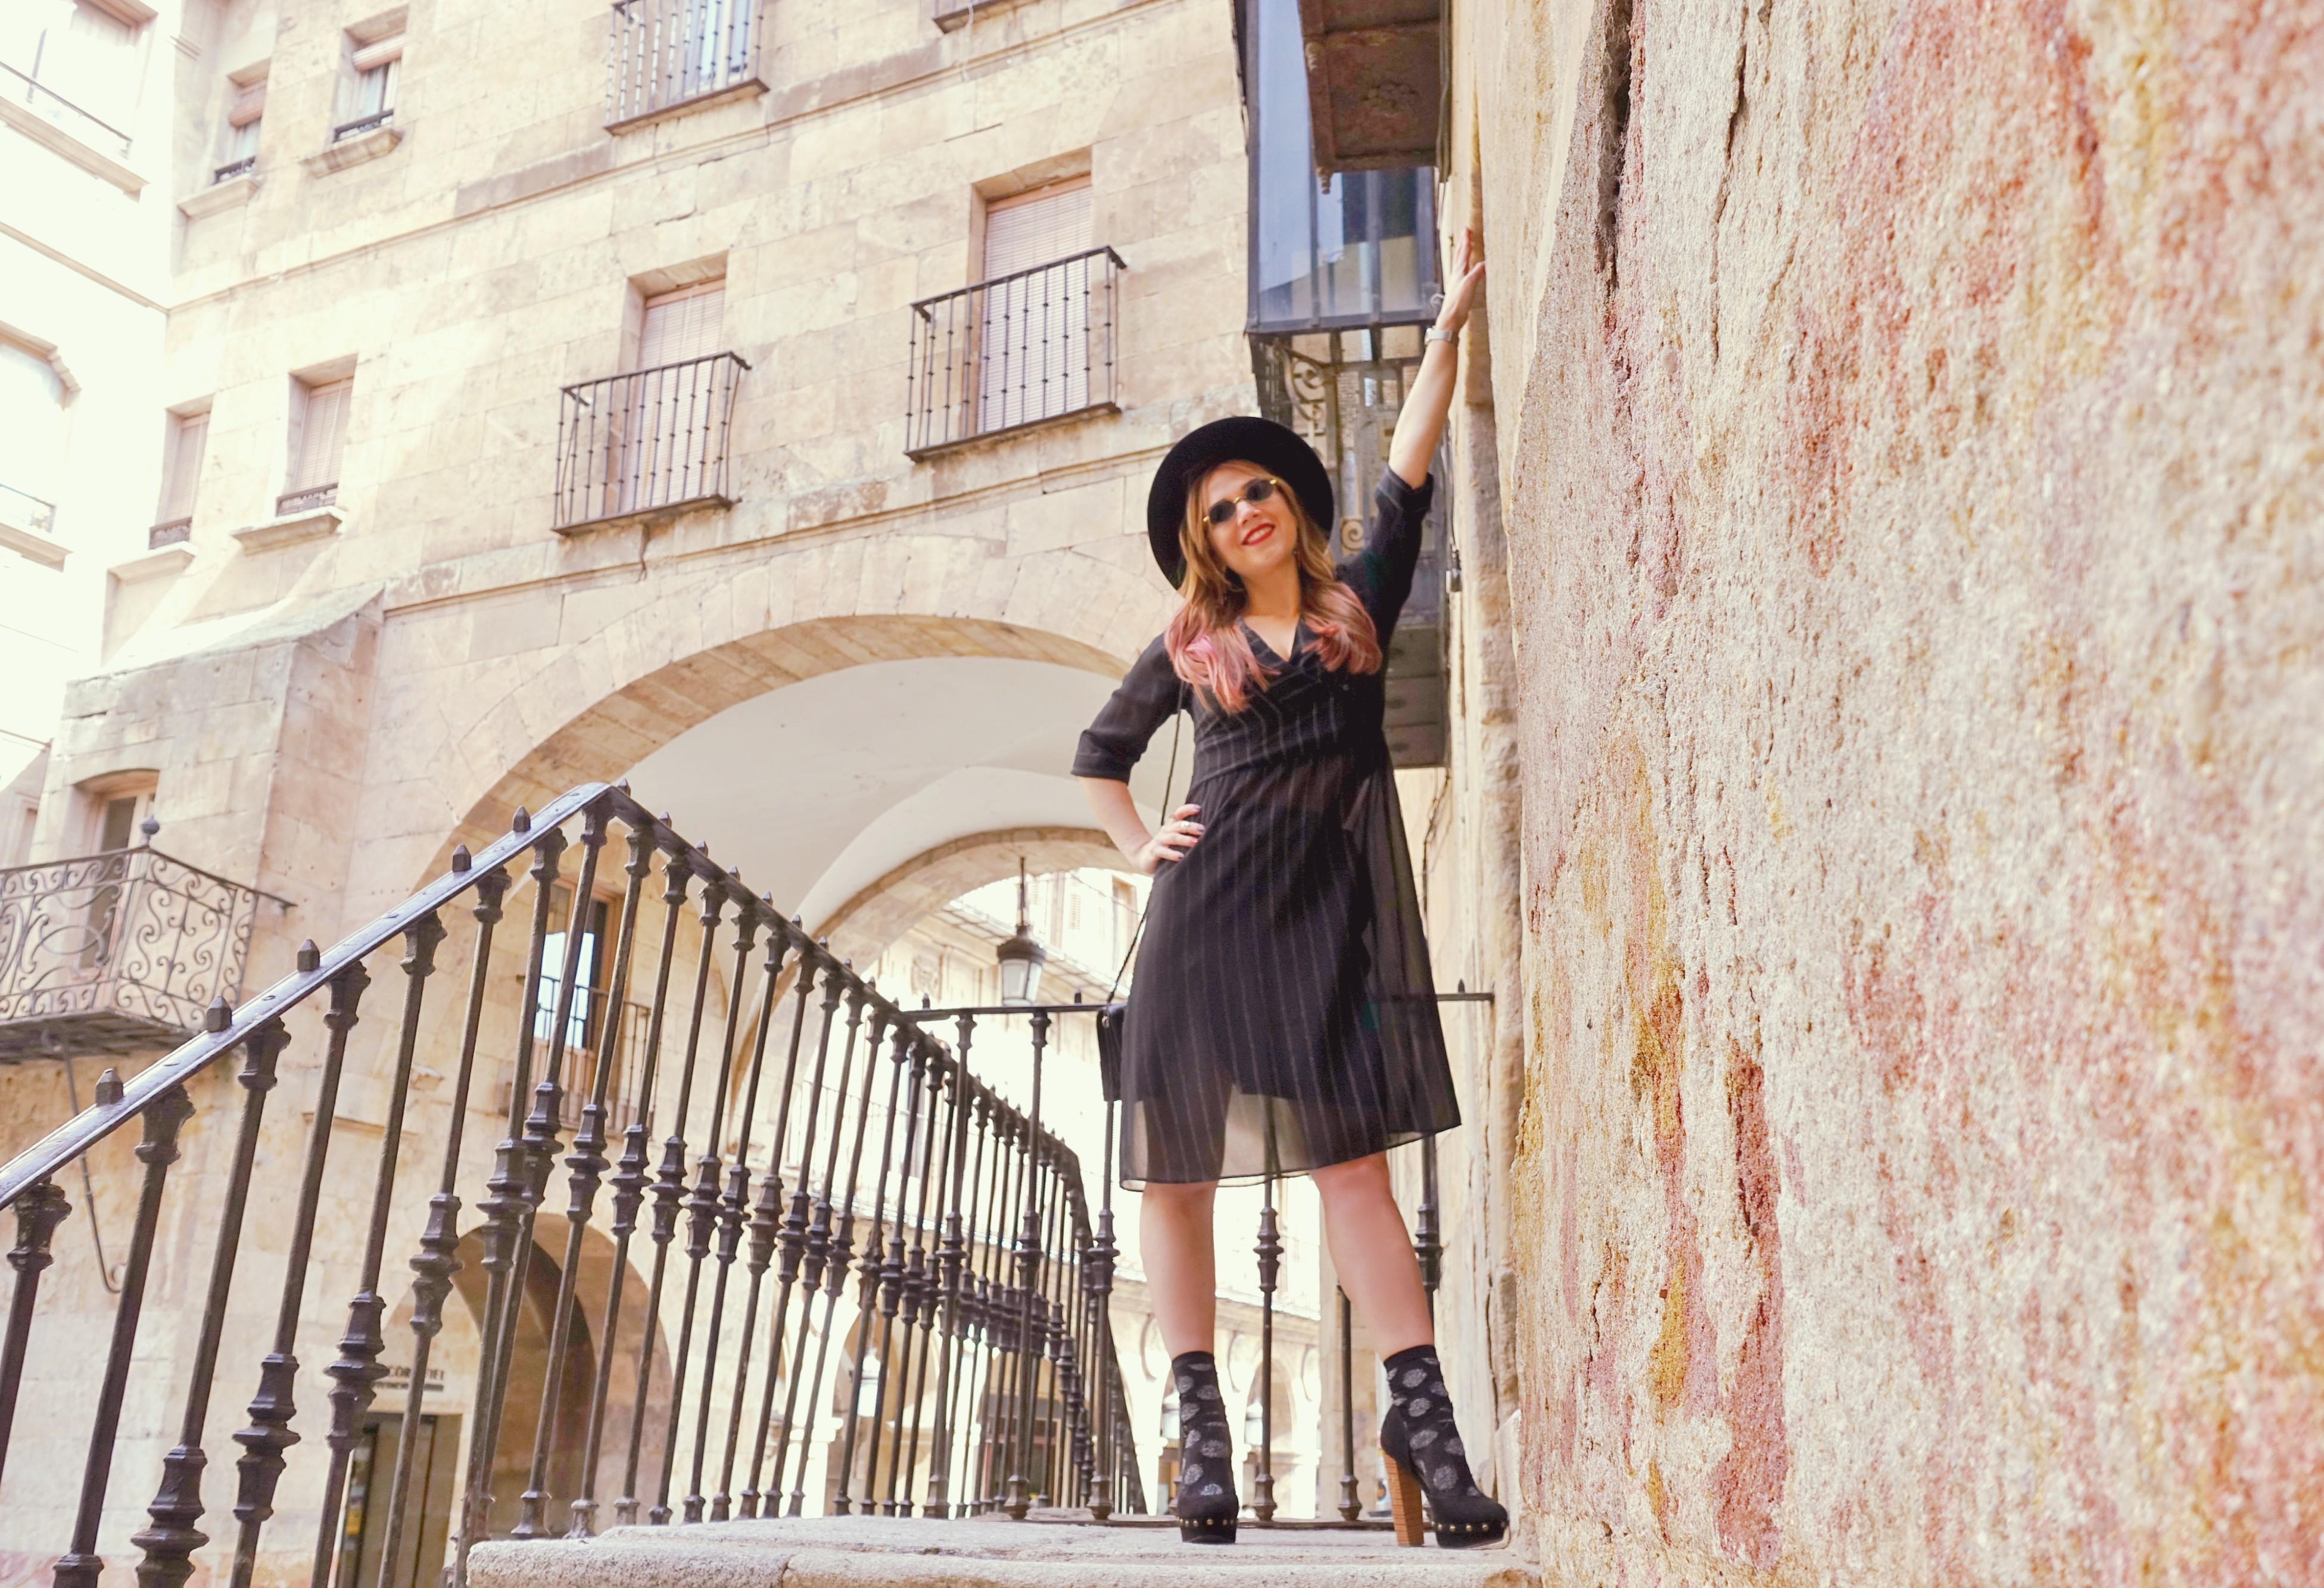 Fashionista-blog-de-moda-PiensaenChic-retro-style-